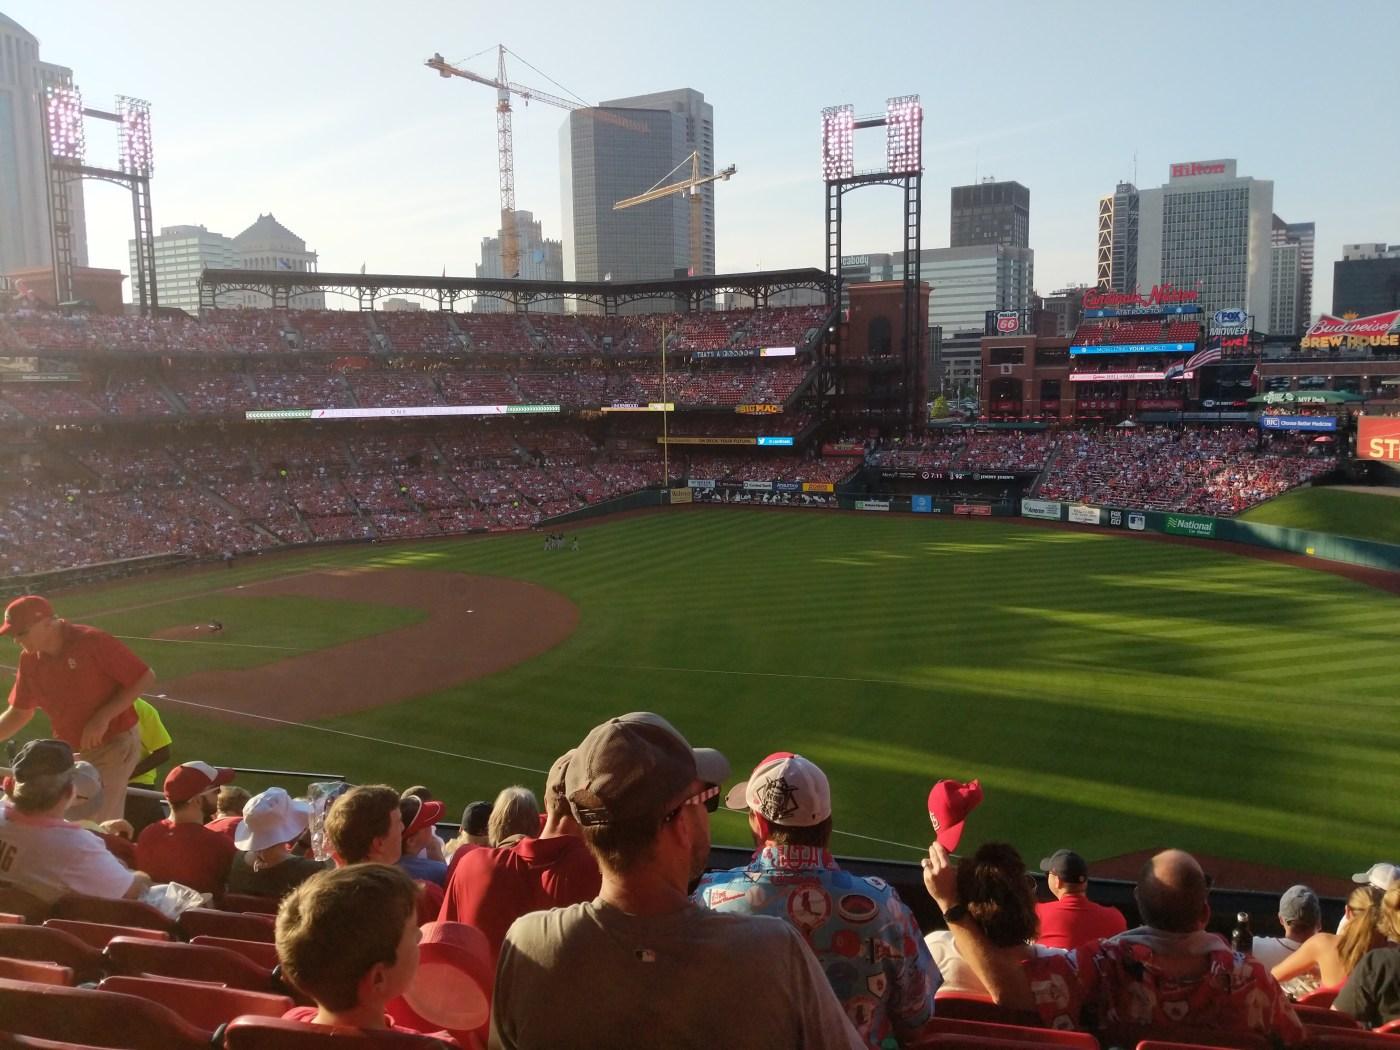 Picture of baseball diamond on far left side of image